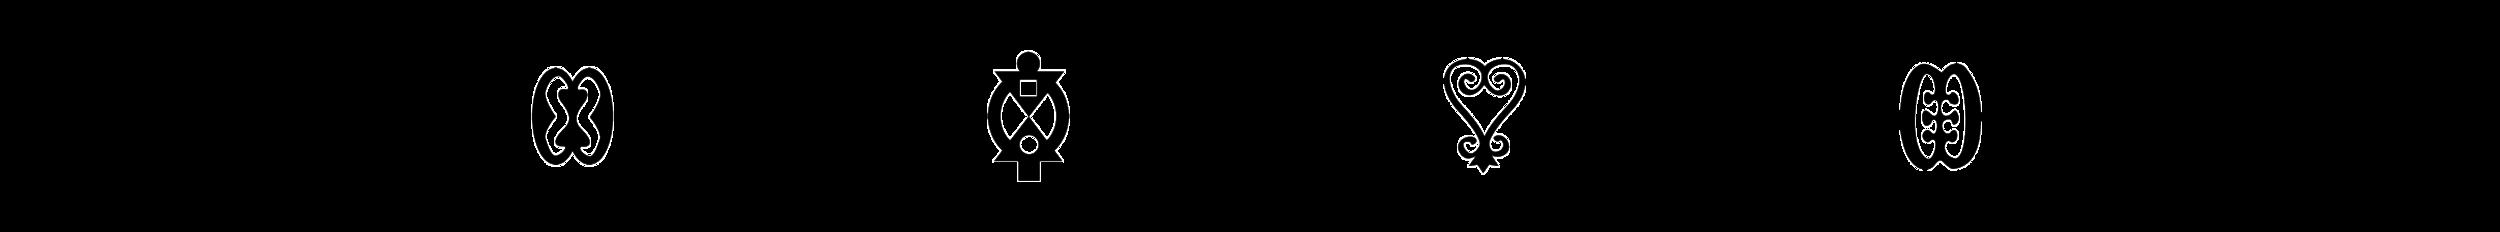 3GC_Adrinka_Symbols.png